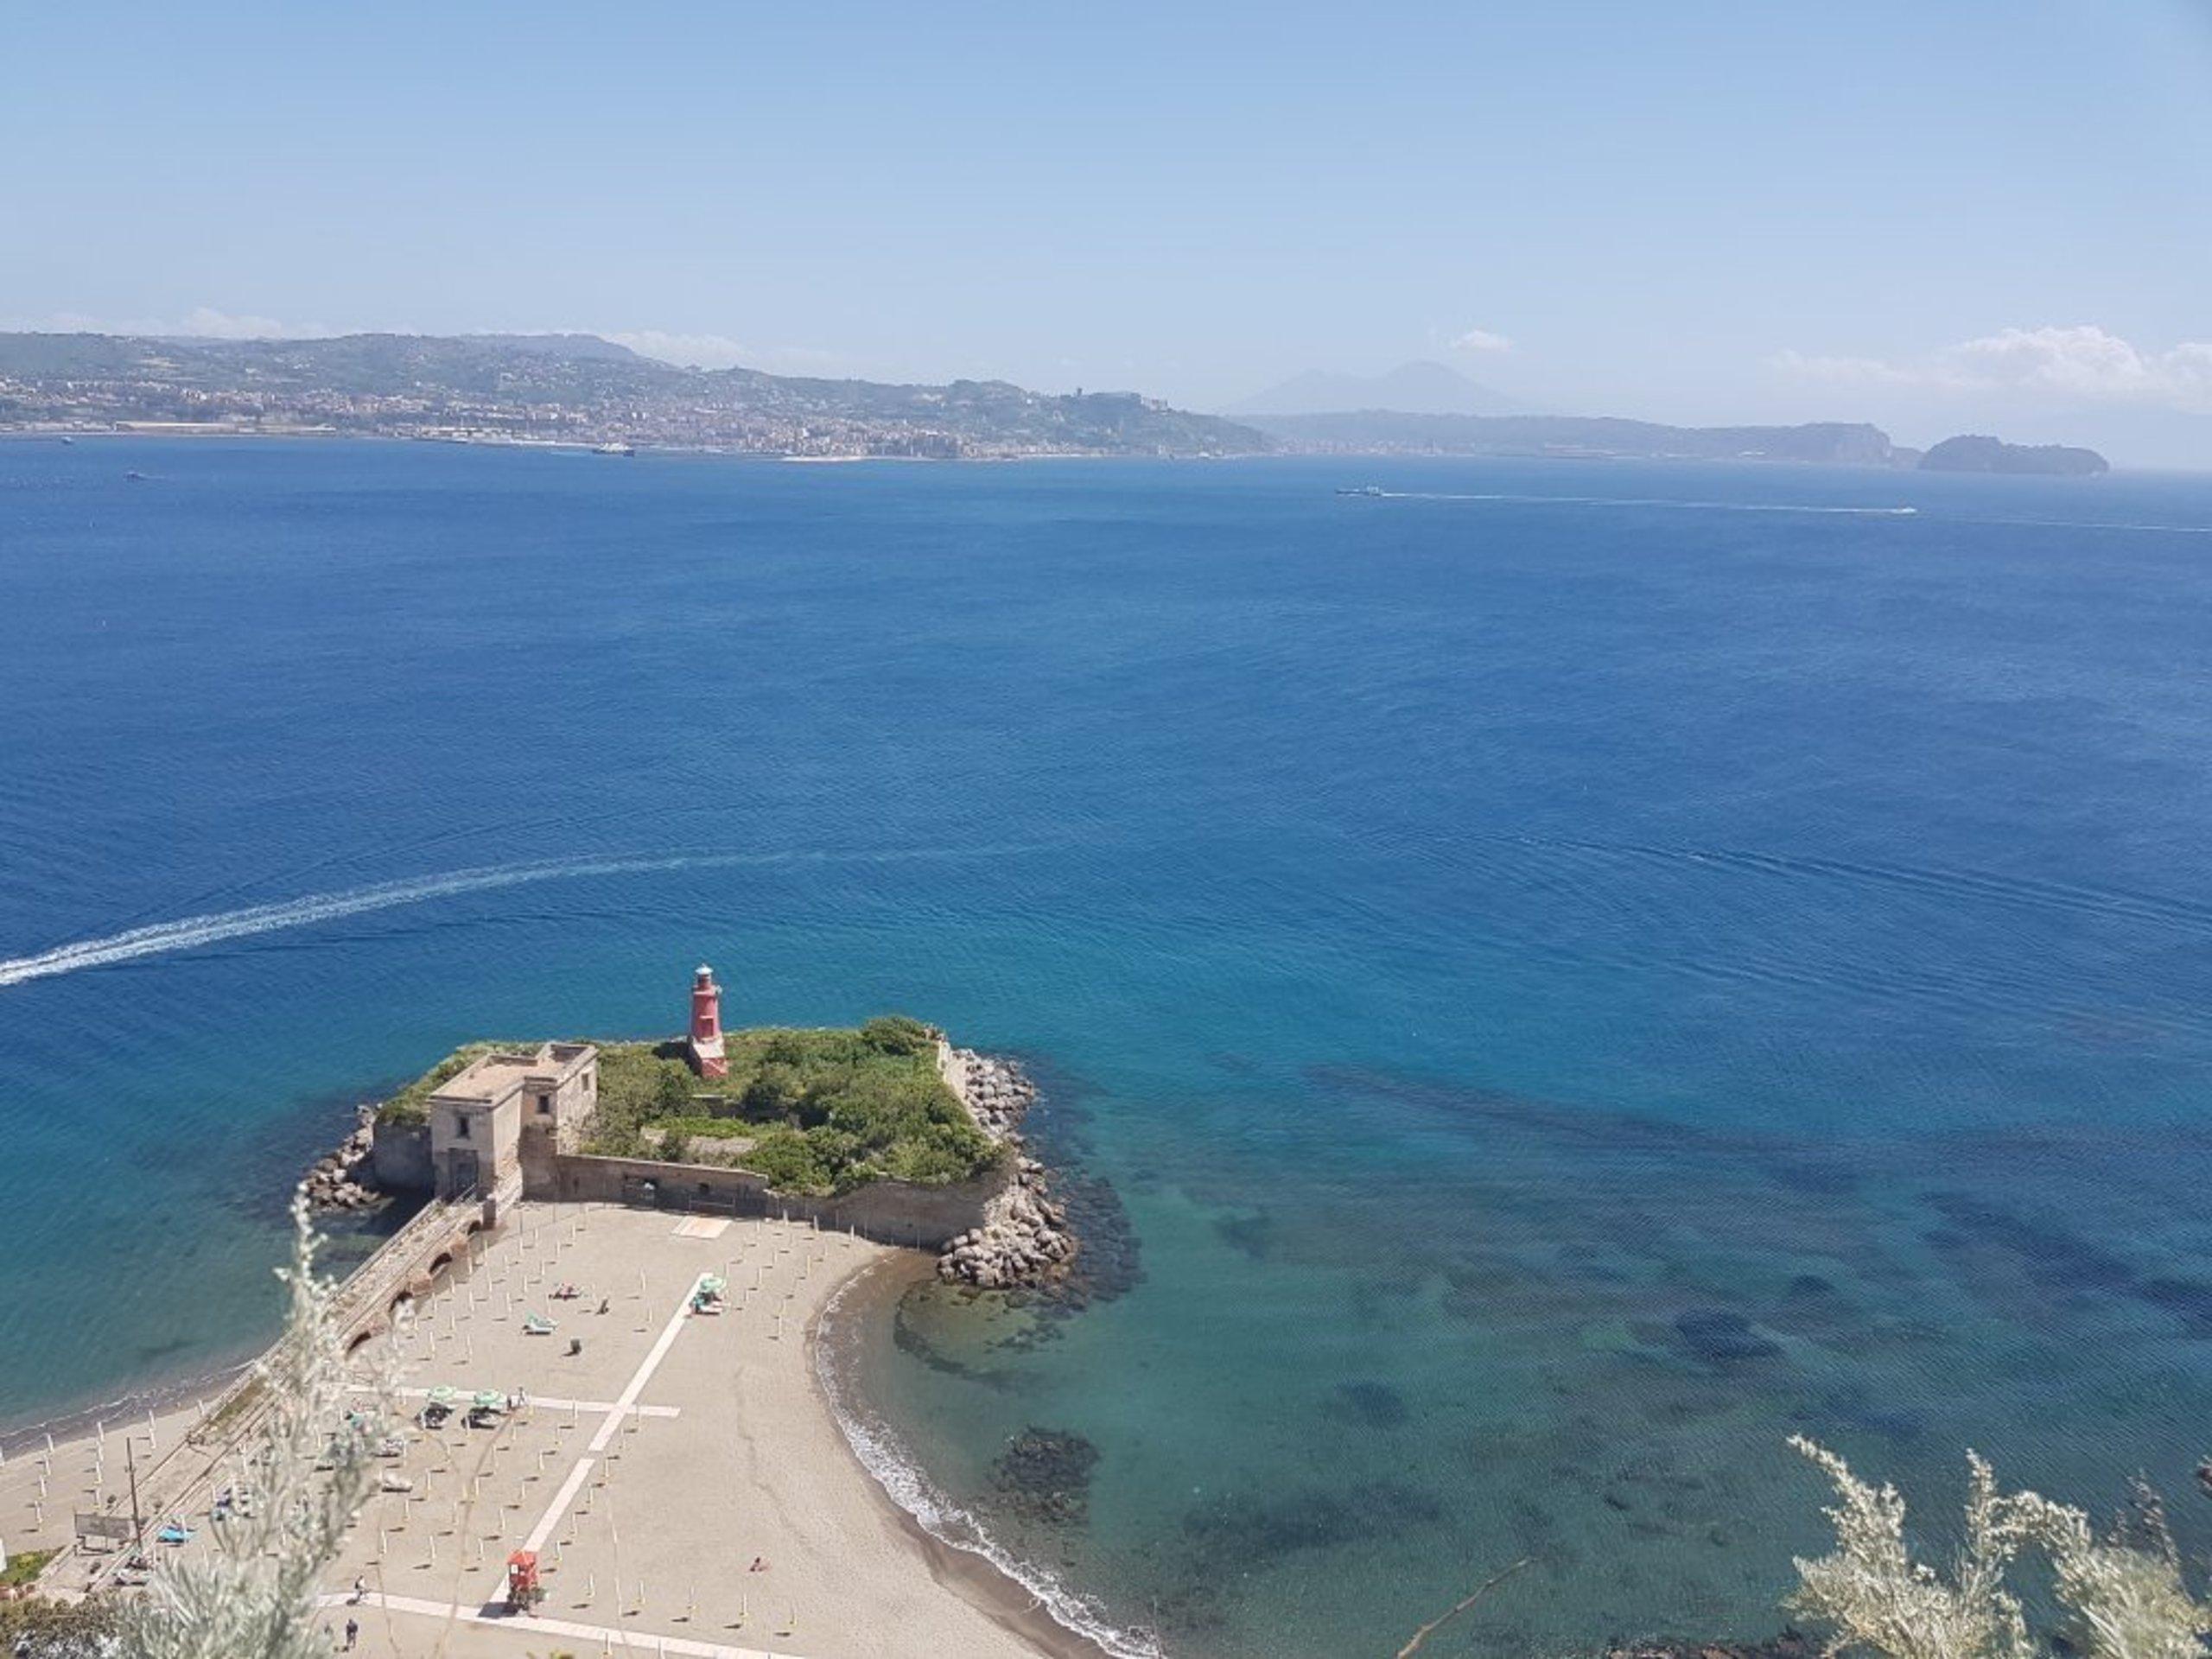 Baiae 2020: Best of Baiae, Italy Tourism - Tripadvisor